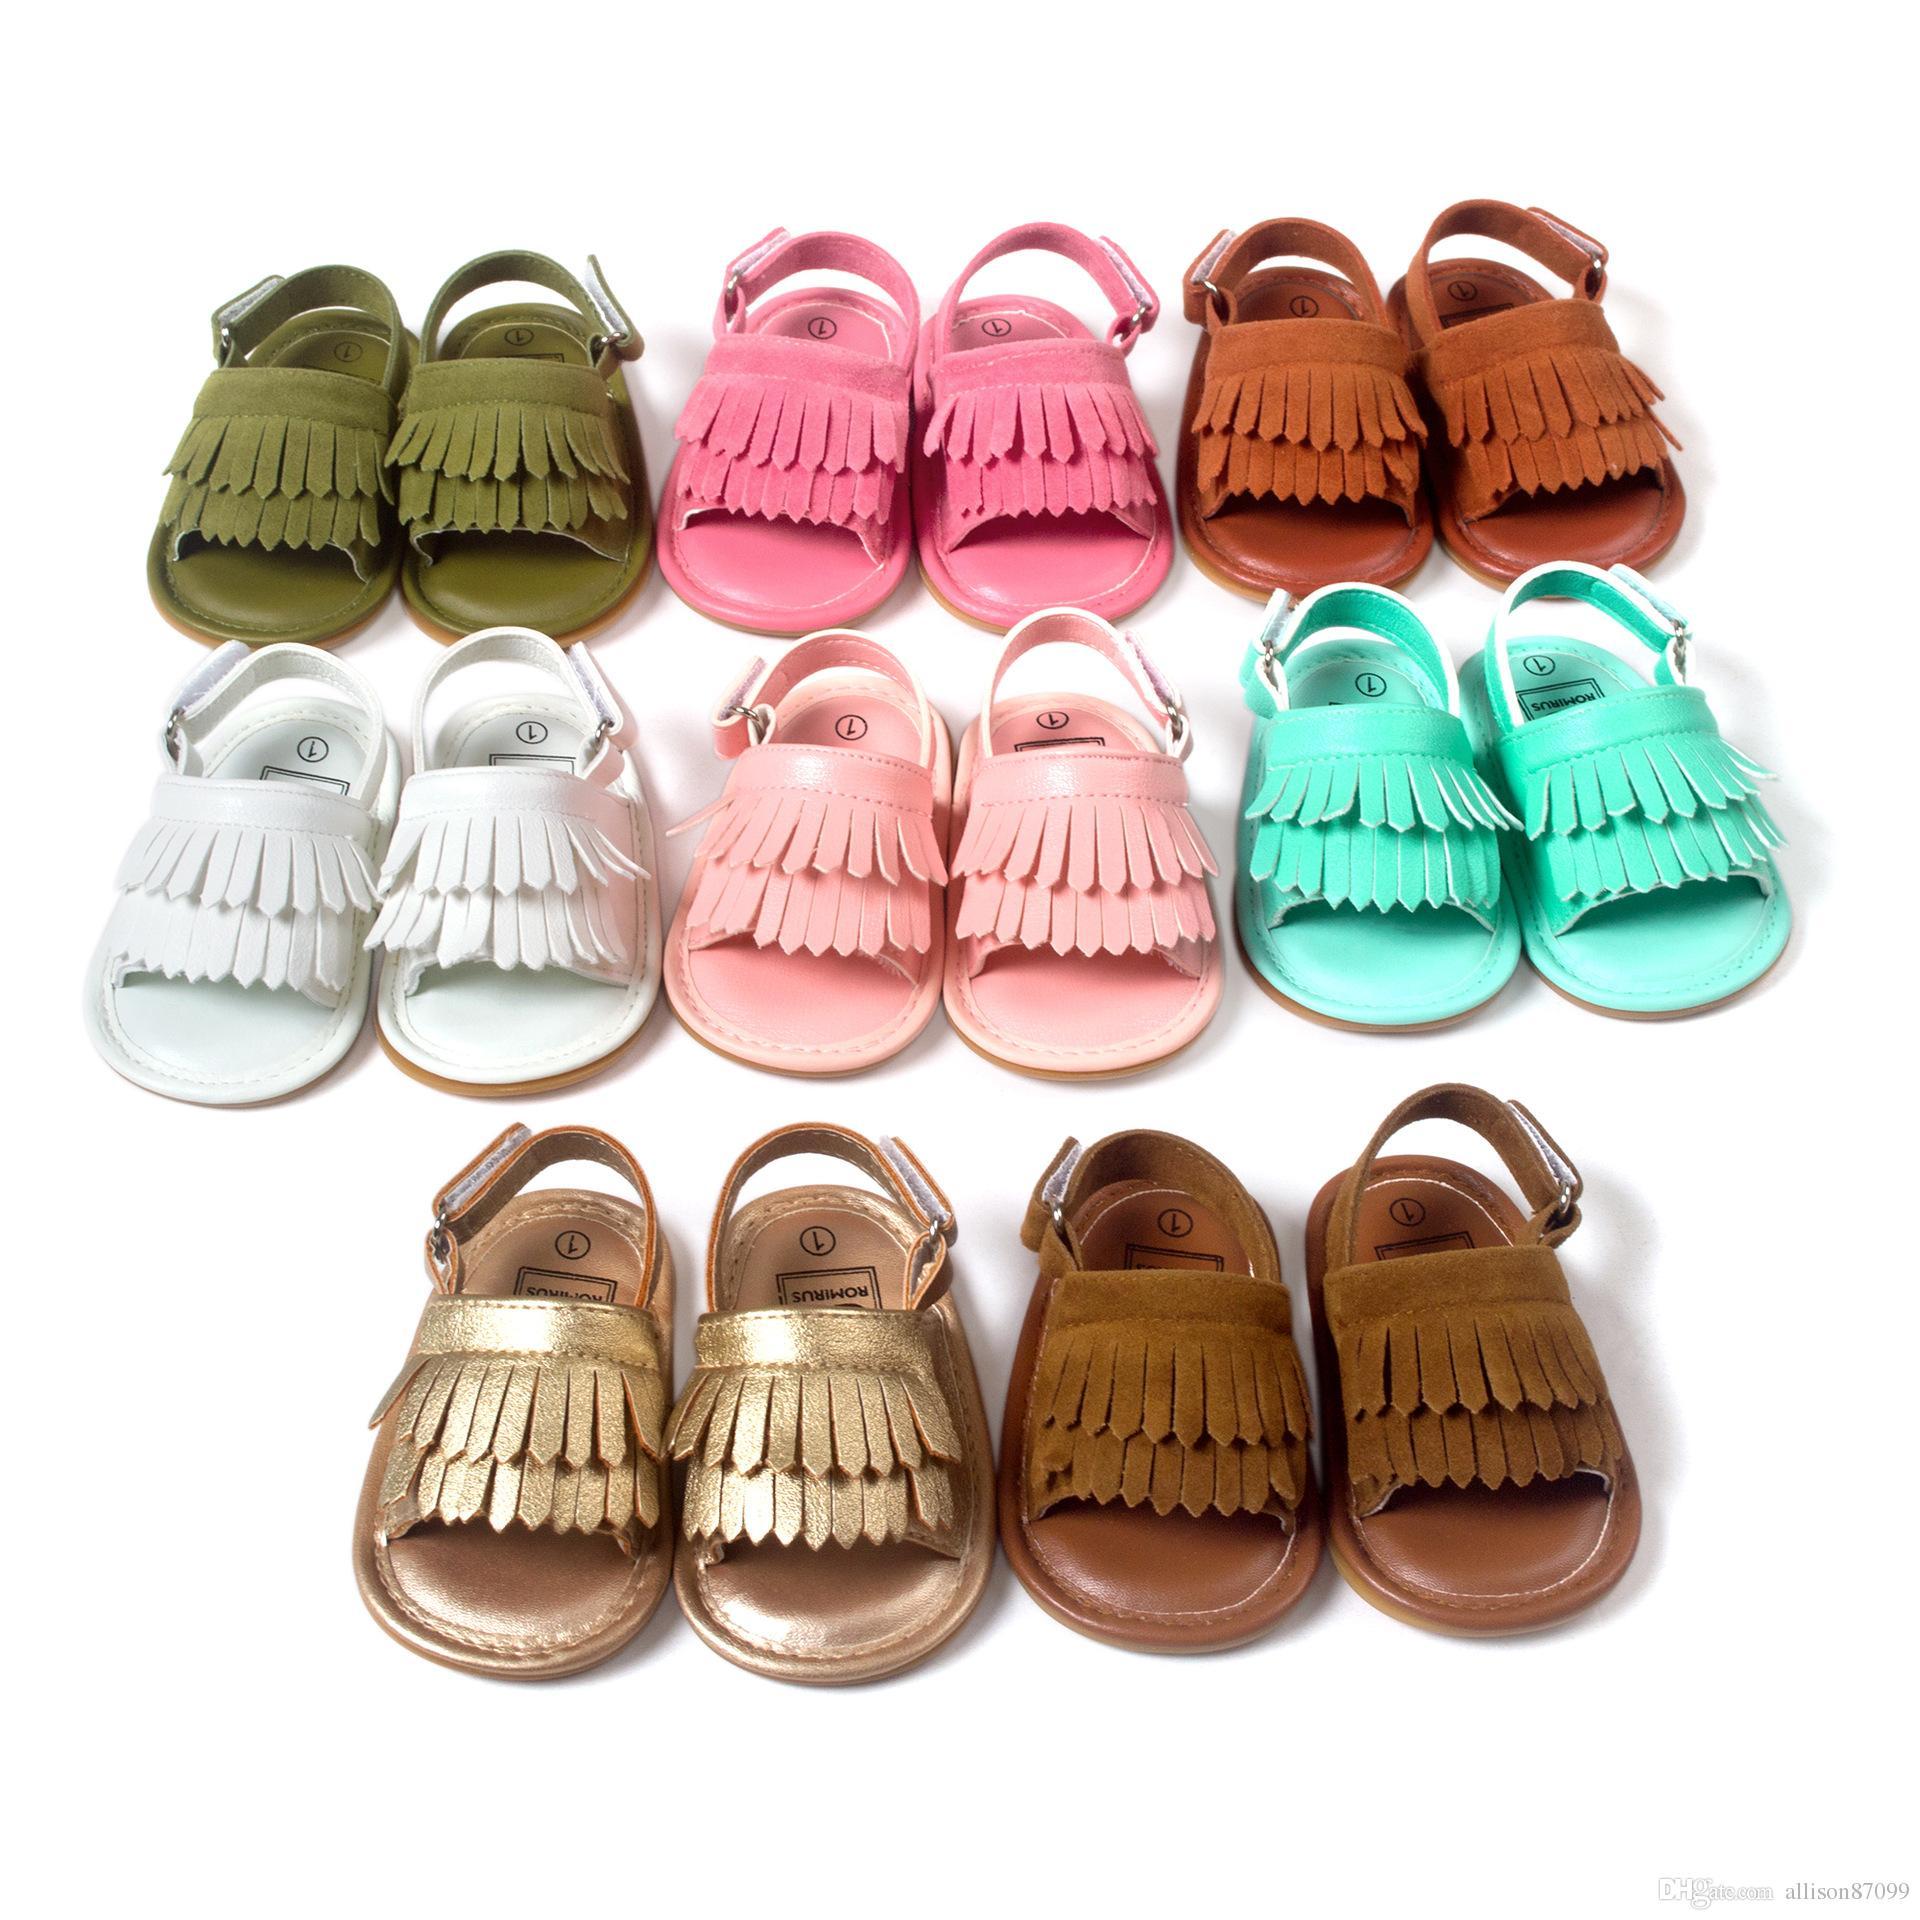 7c8dd29ce43d 2019 Kid Shoes Sandal Baby Shoes Children Sandals Infant Boys Girls Summer  Kids Footwear Toddler FREE DHL Kids Shoes Online Kids Sneakers From  Allison87099